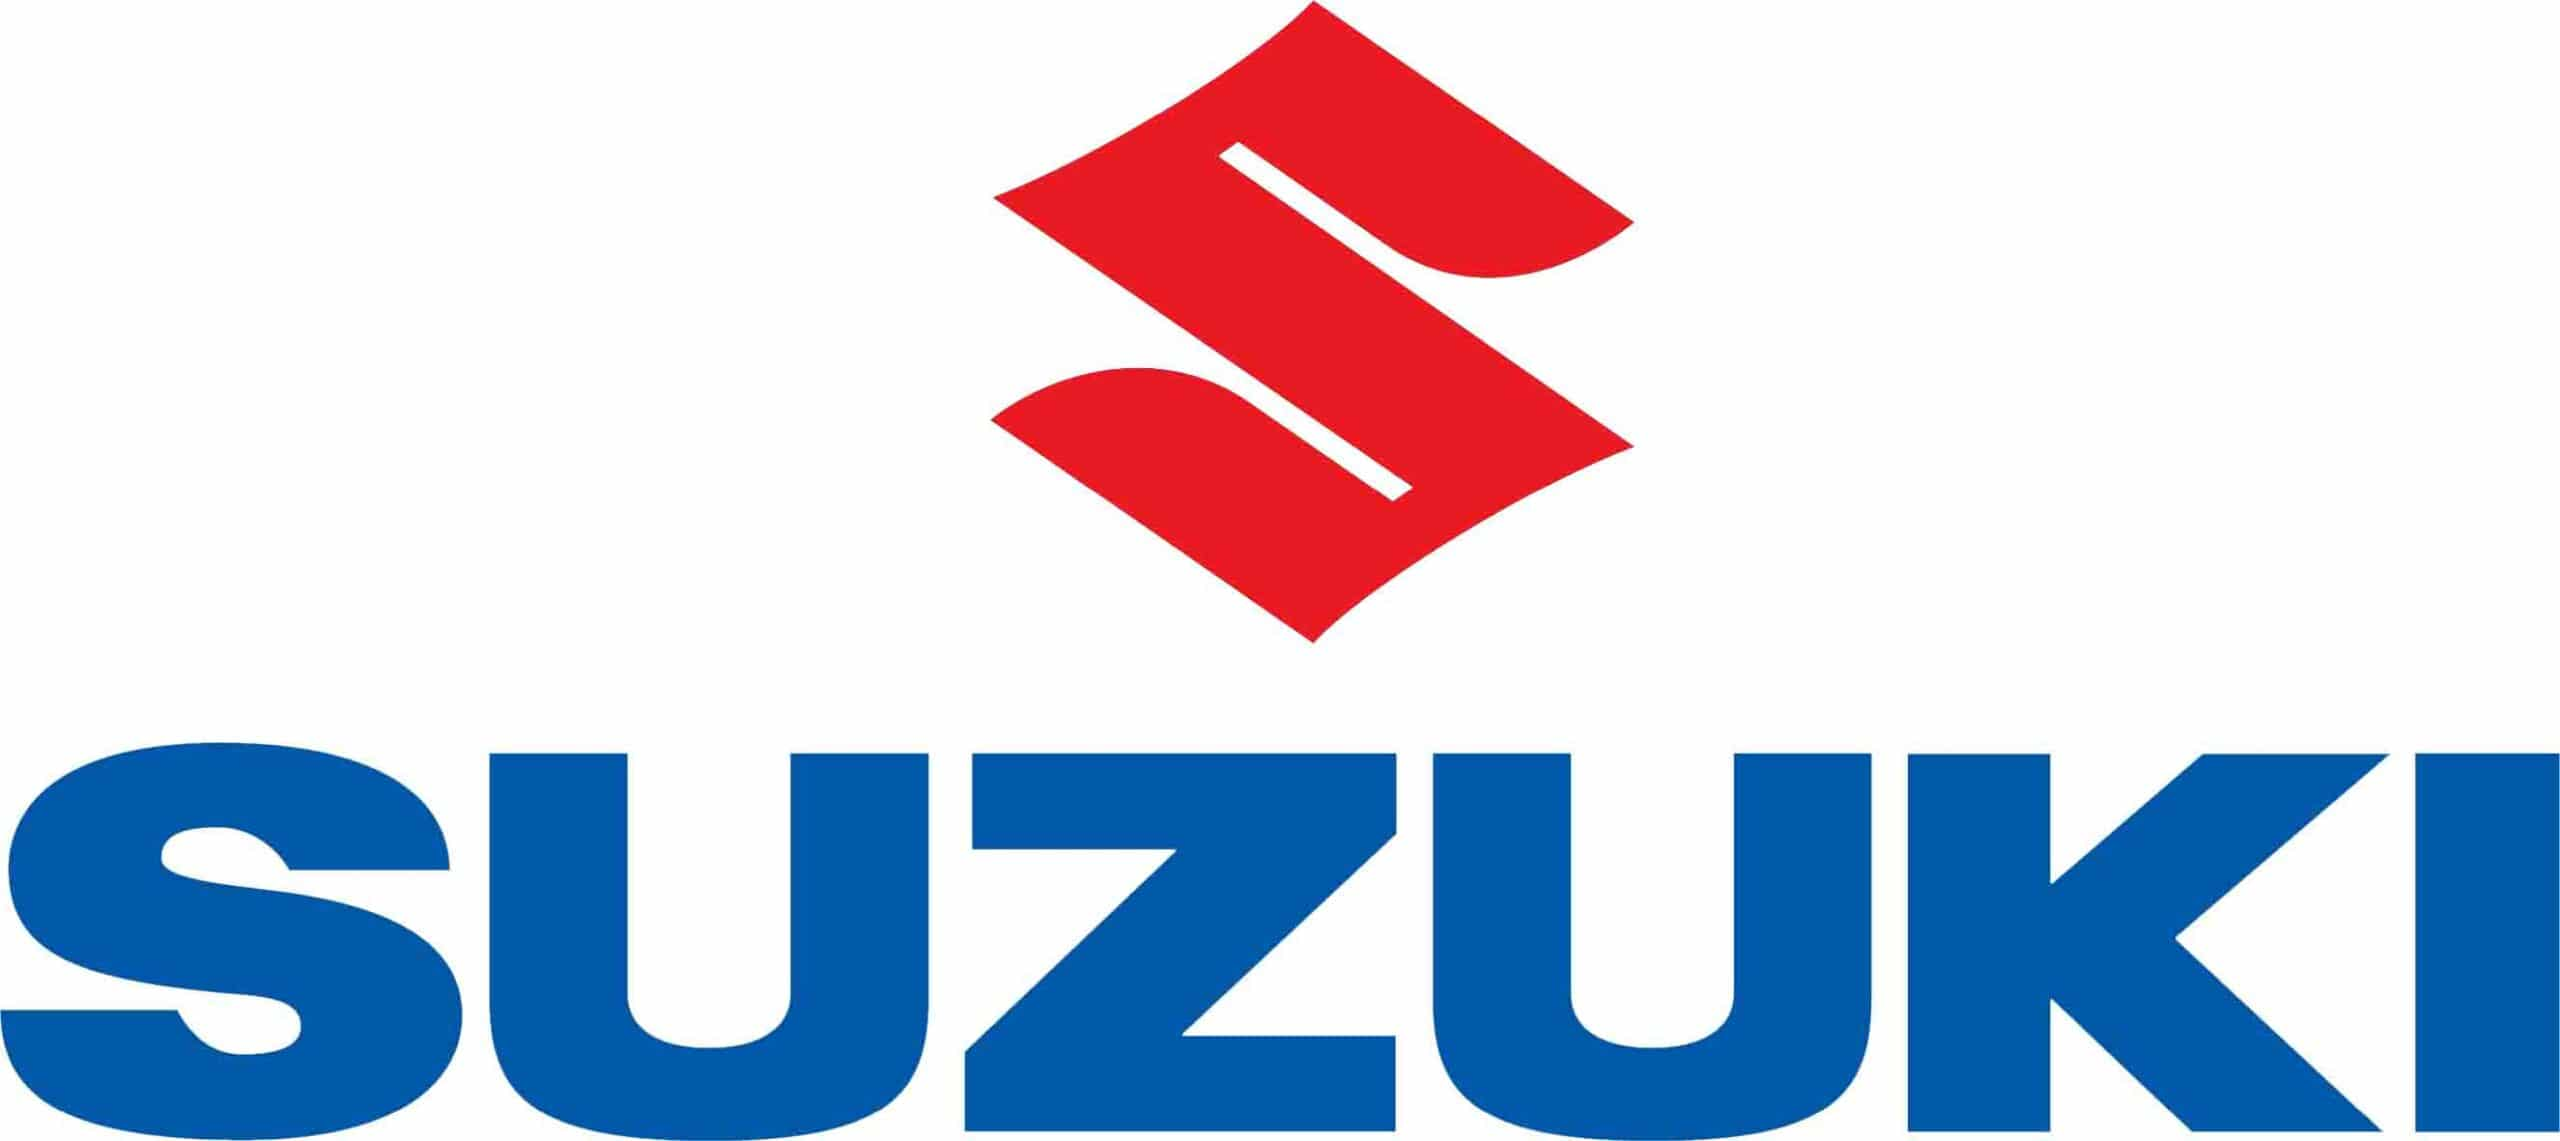 Catalogo de Partes para Autos Suzuki